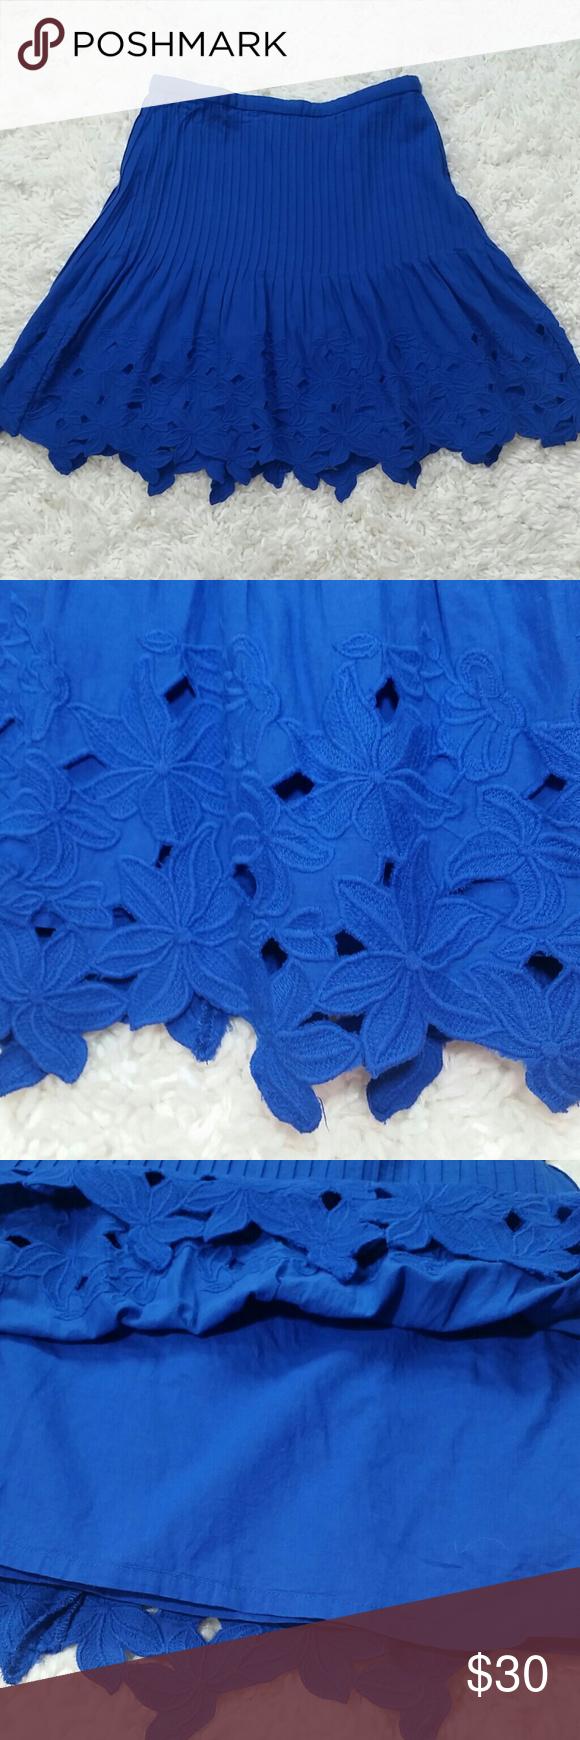 Cobalt Blue Eyelet Cotton